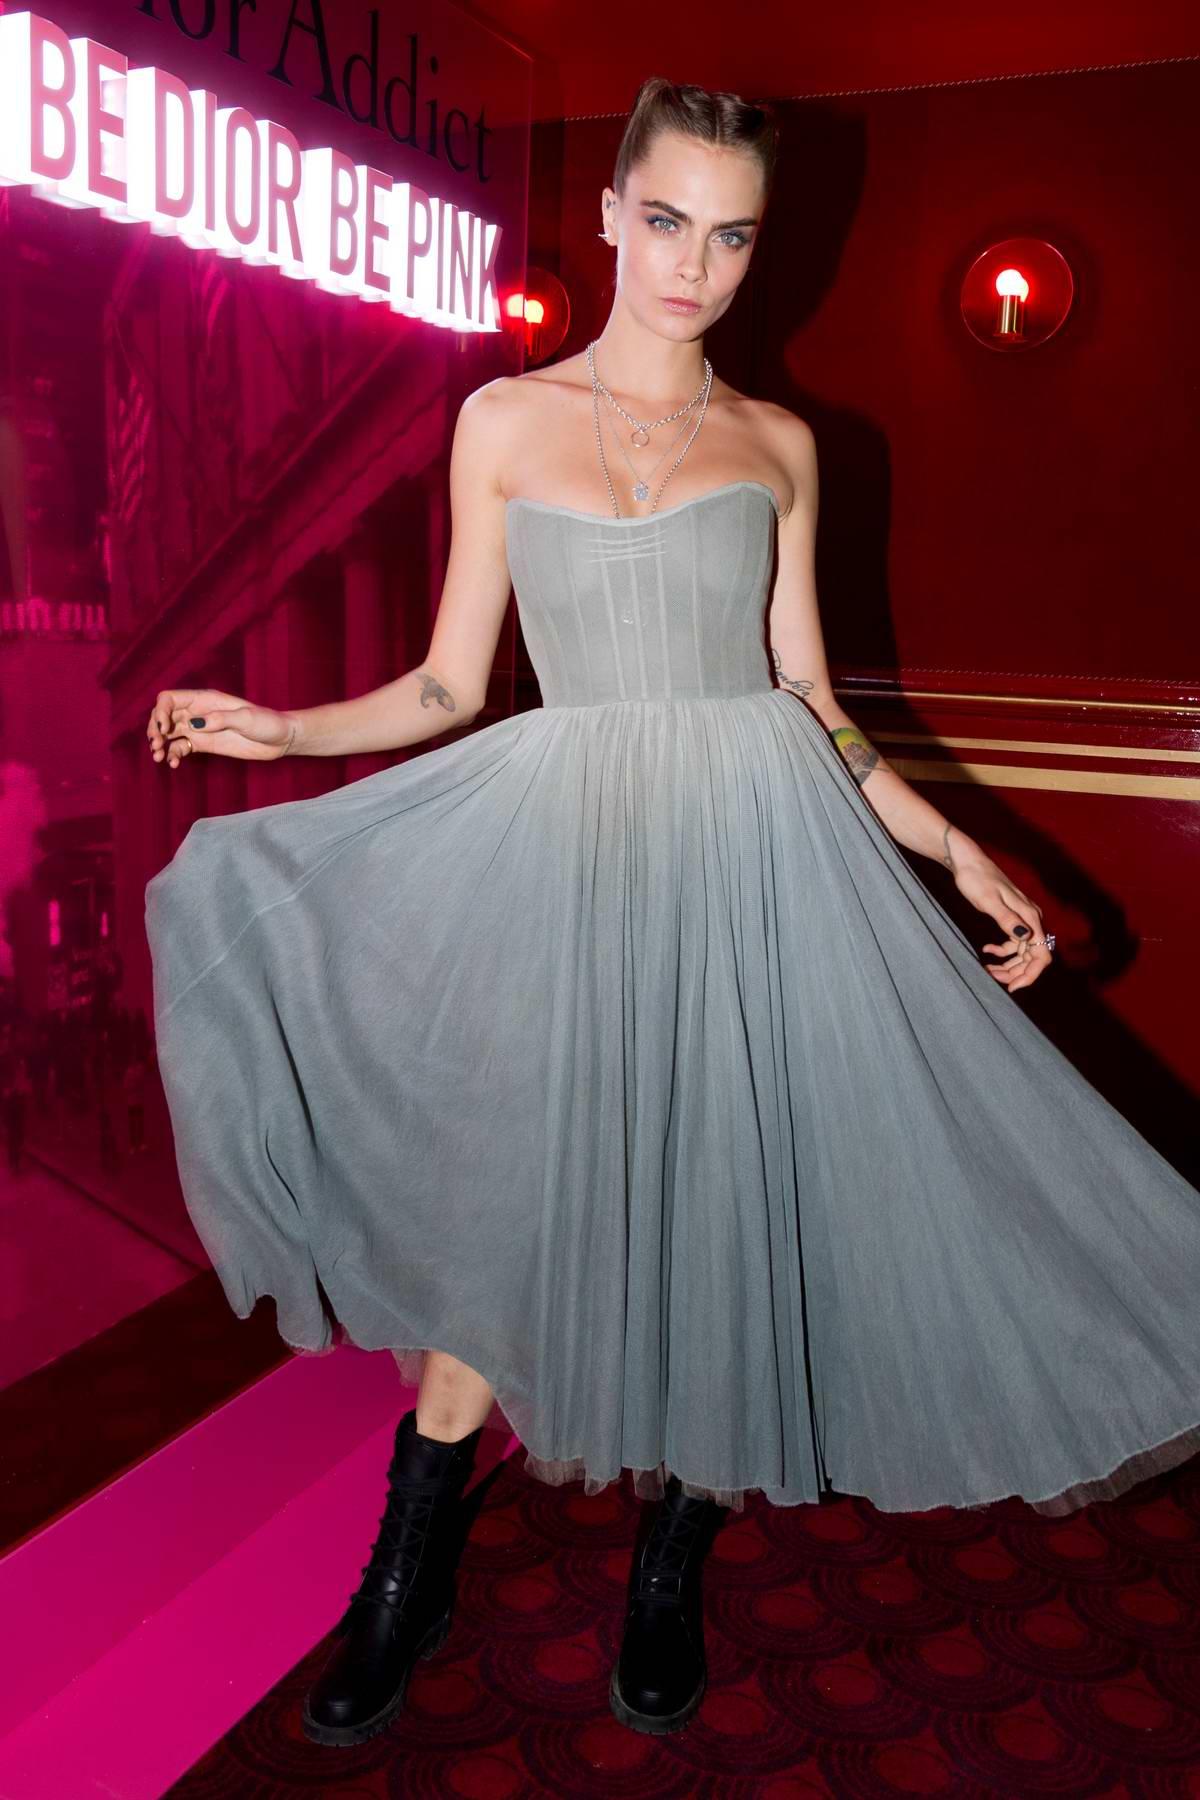 Cara Delevingne attends the Dior Addict Stellar Shine diner party during Paris Fashion Week in Paris, France